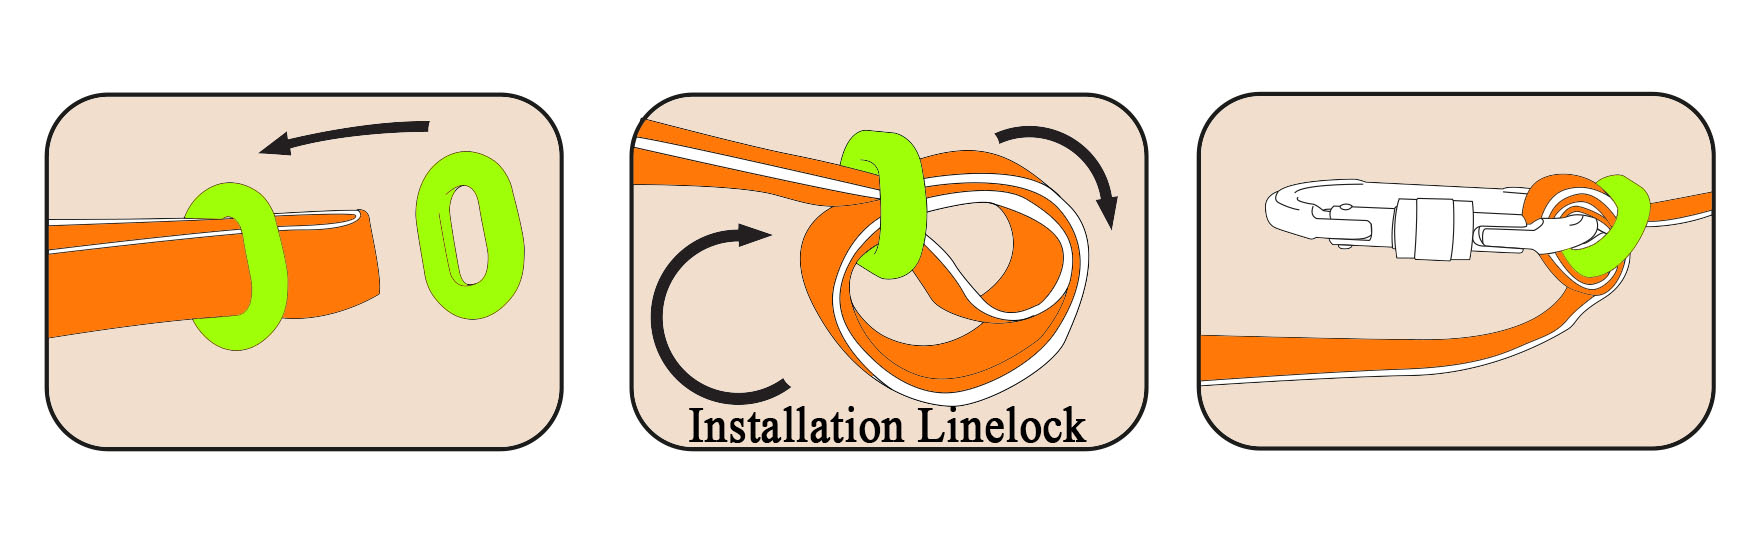 Linelock user guide